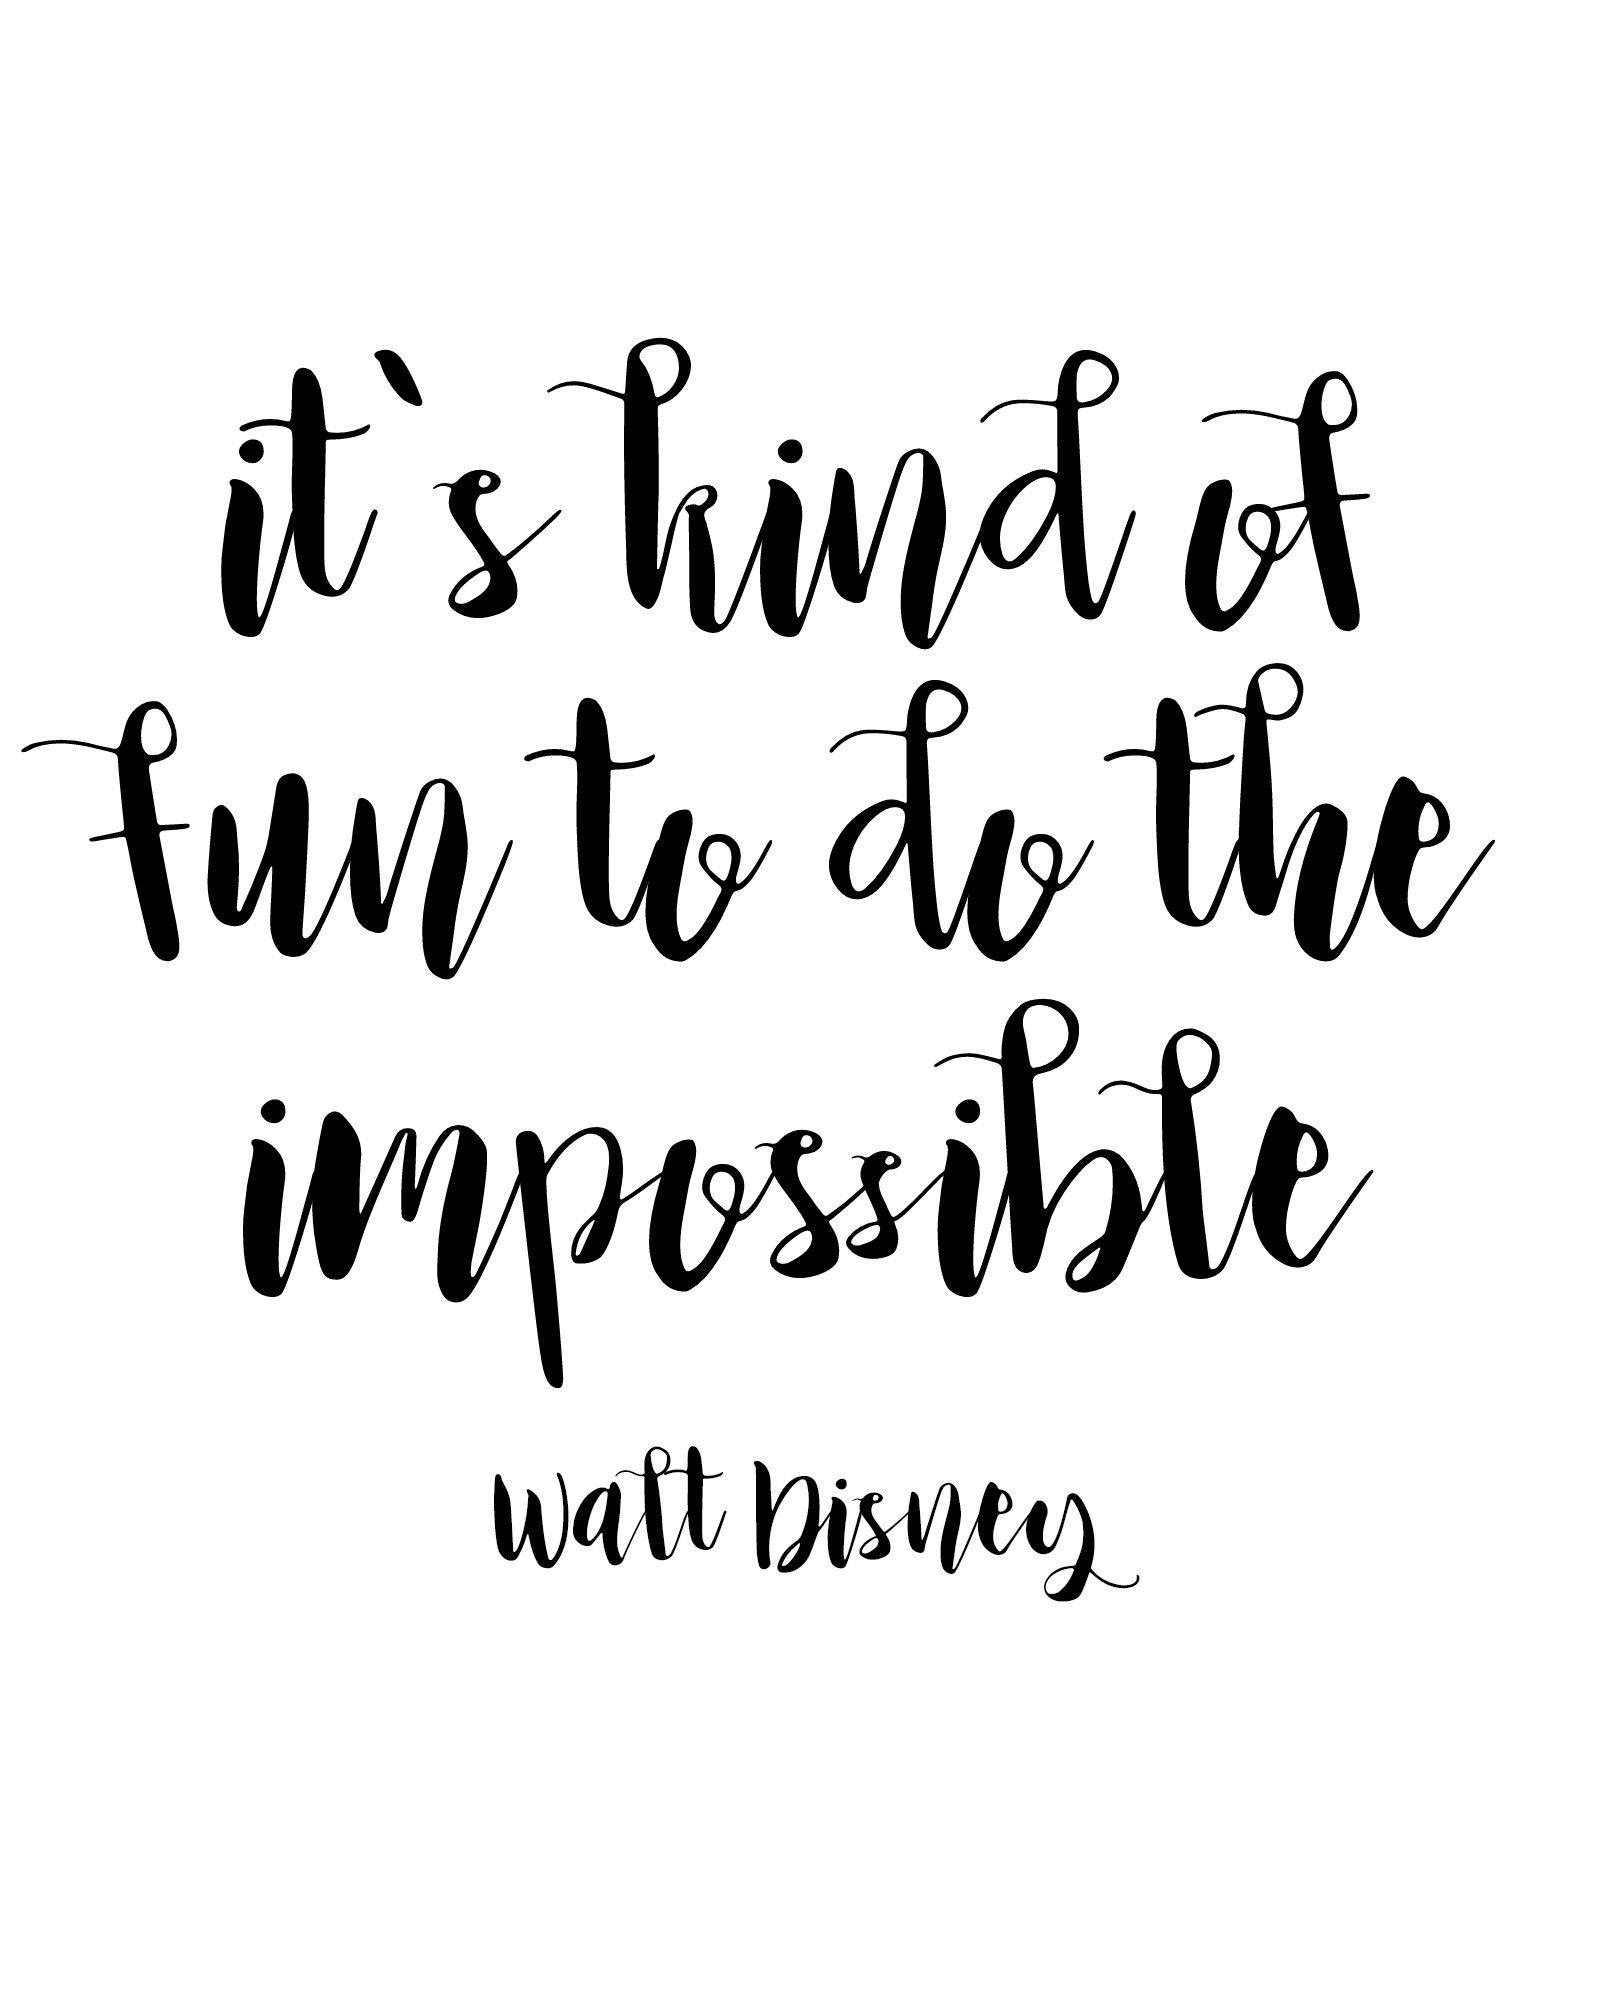 Walt Disney Quotes - Best Motivational Quotes - quotes.diem ...